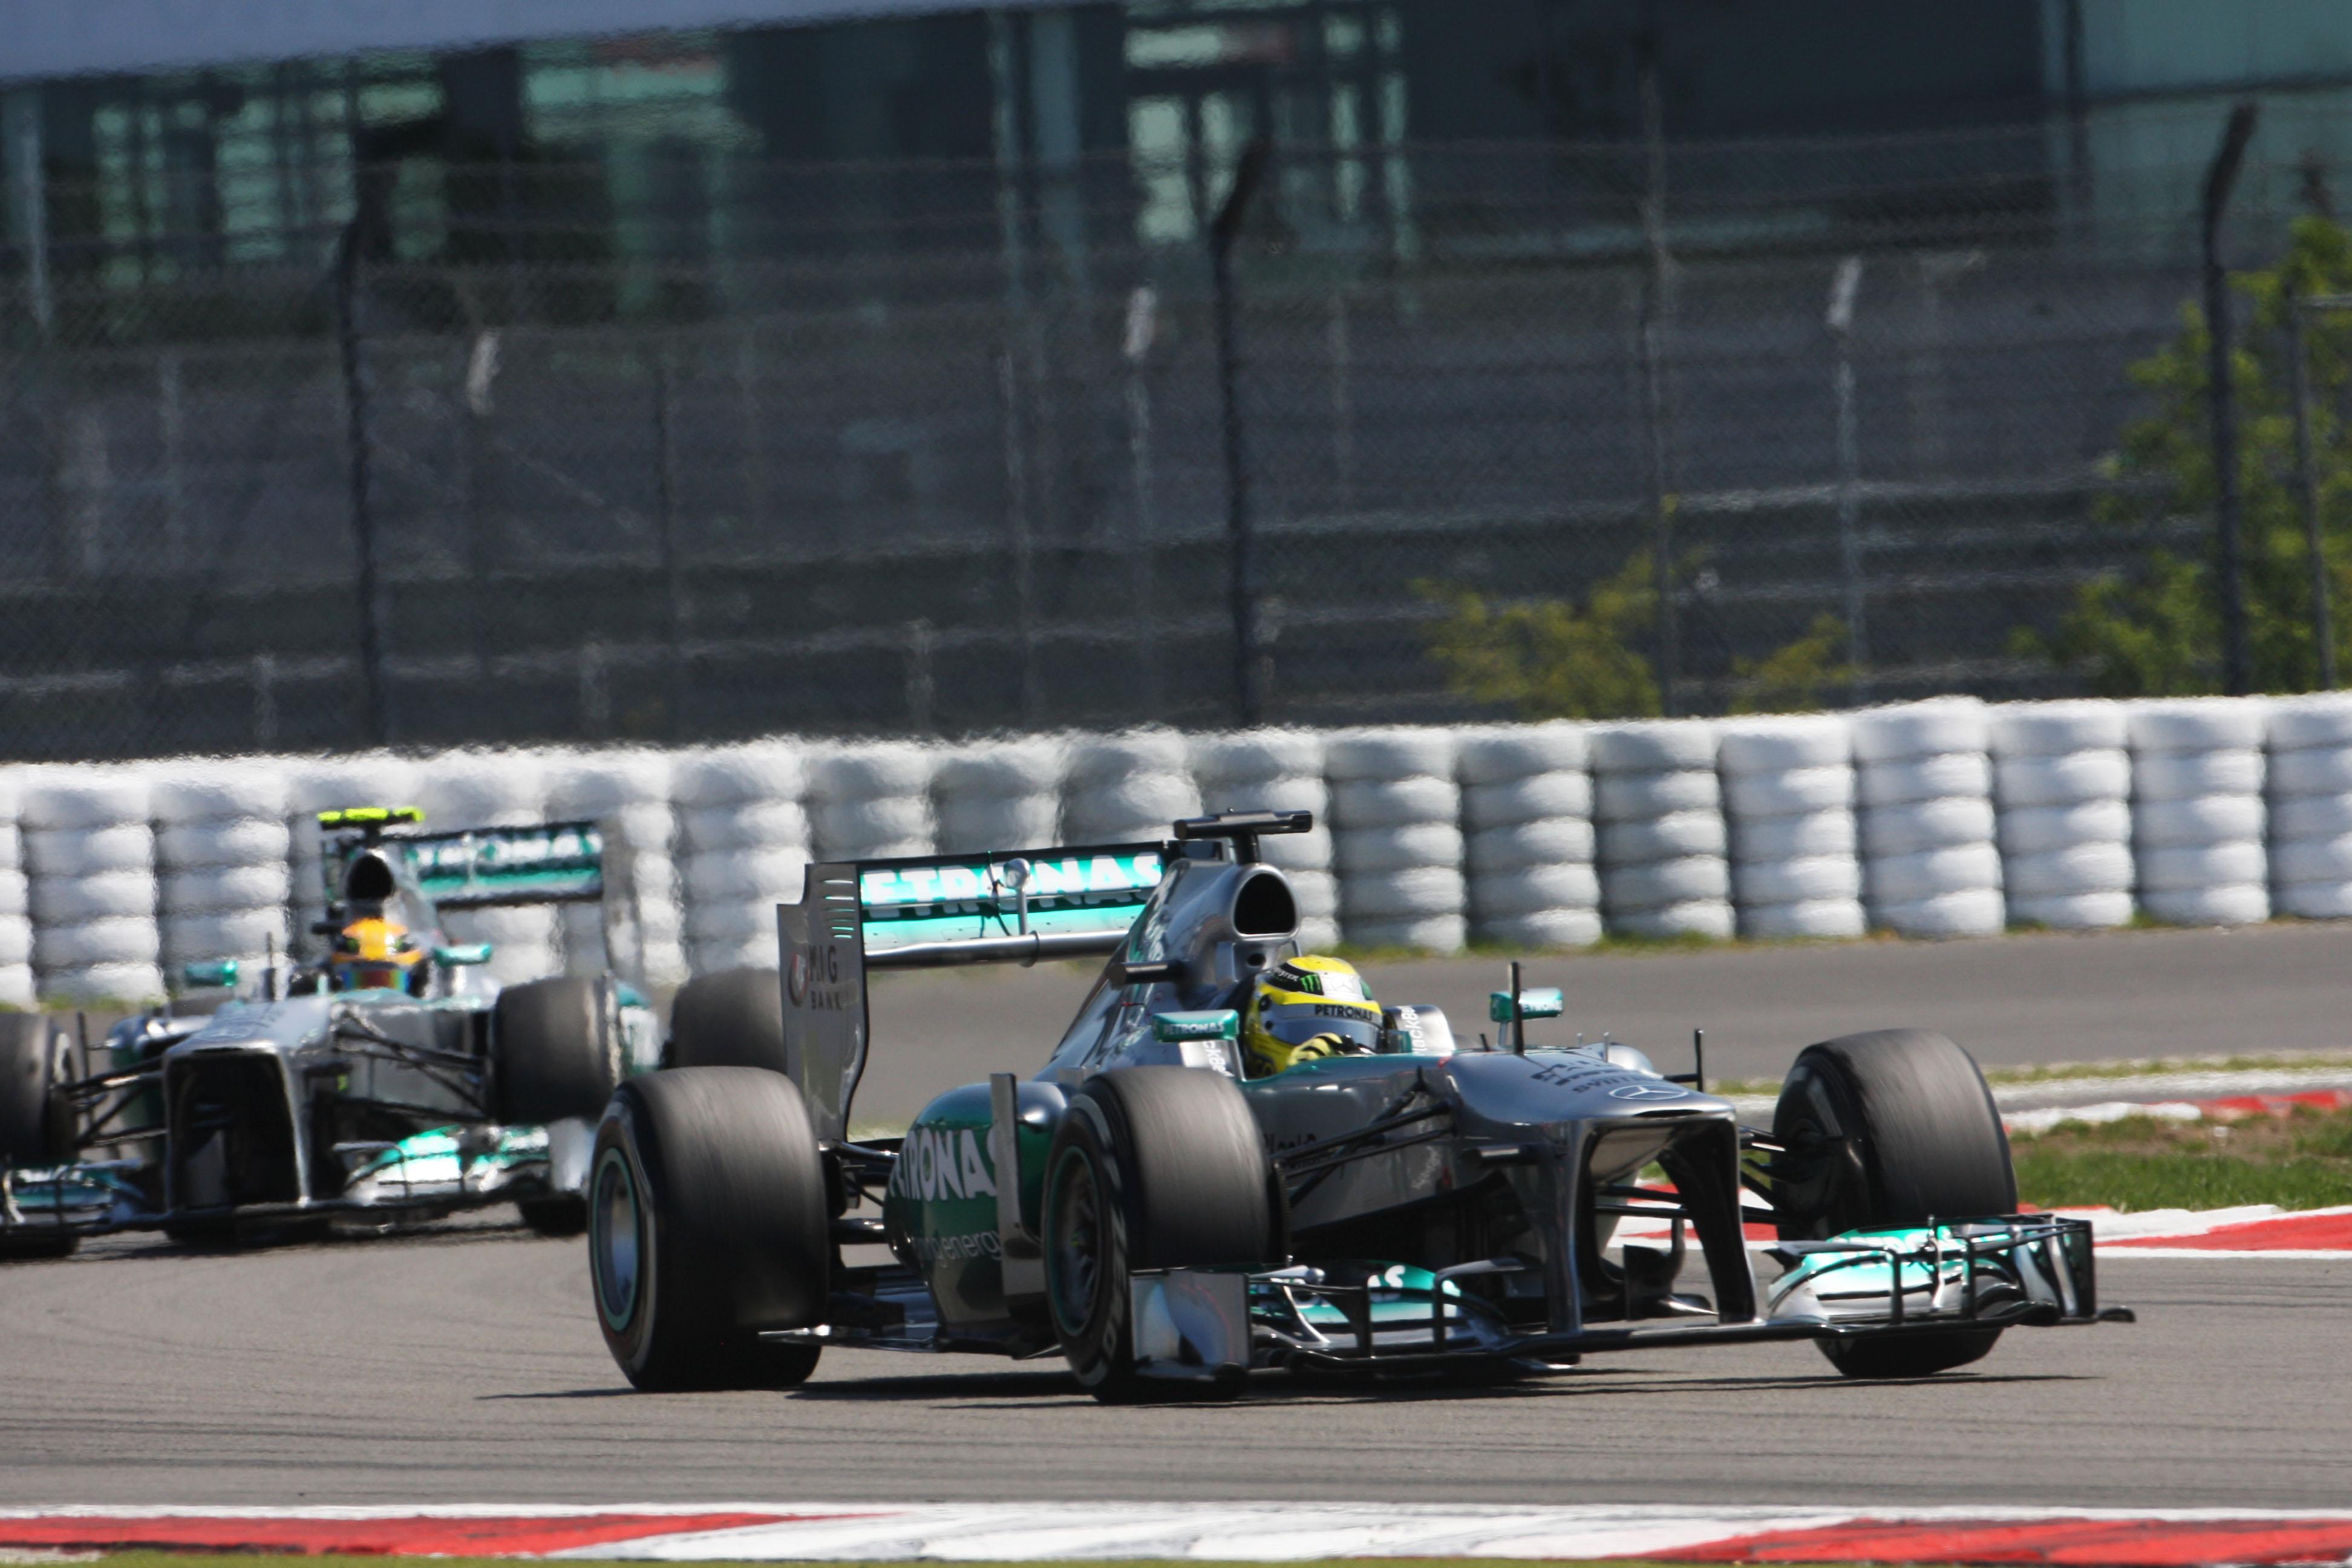 Nico Rosberg Lewis Hamilton Mercedes Nurburgring 2013